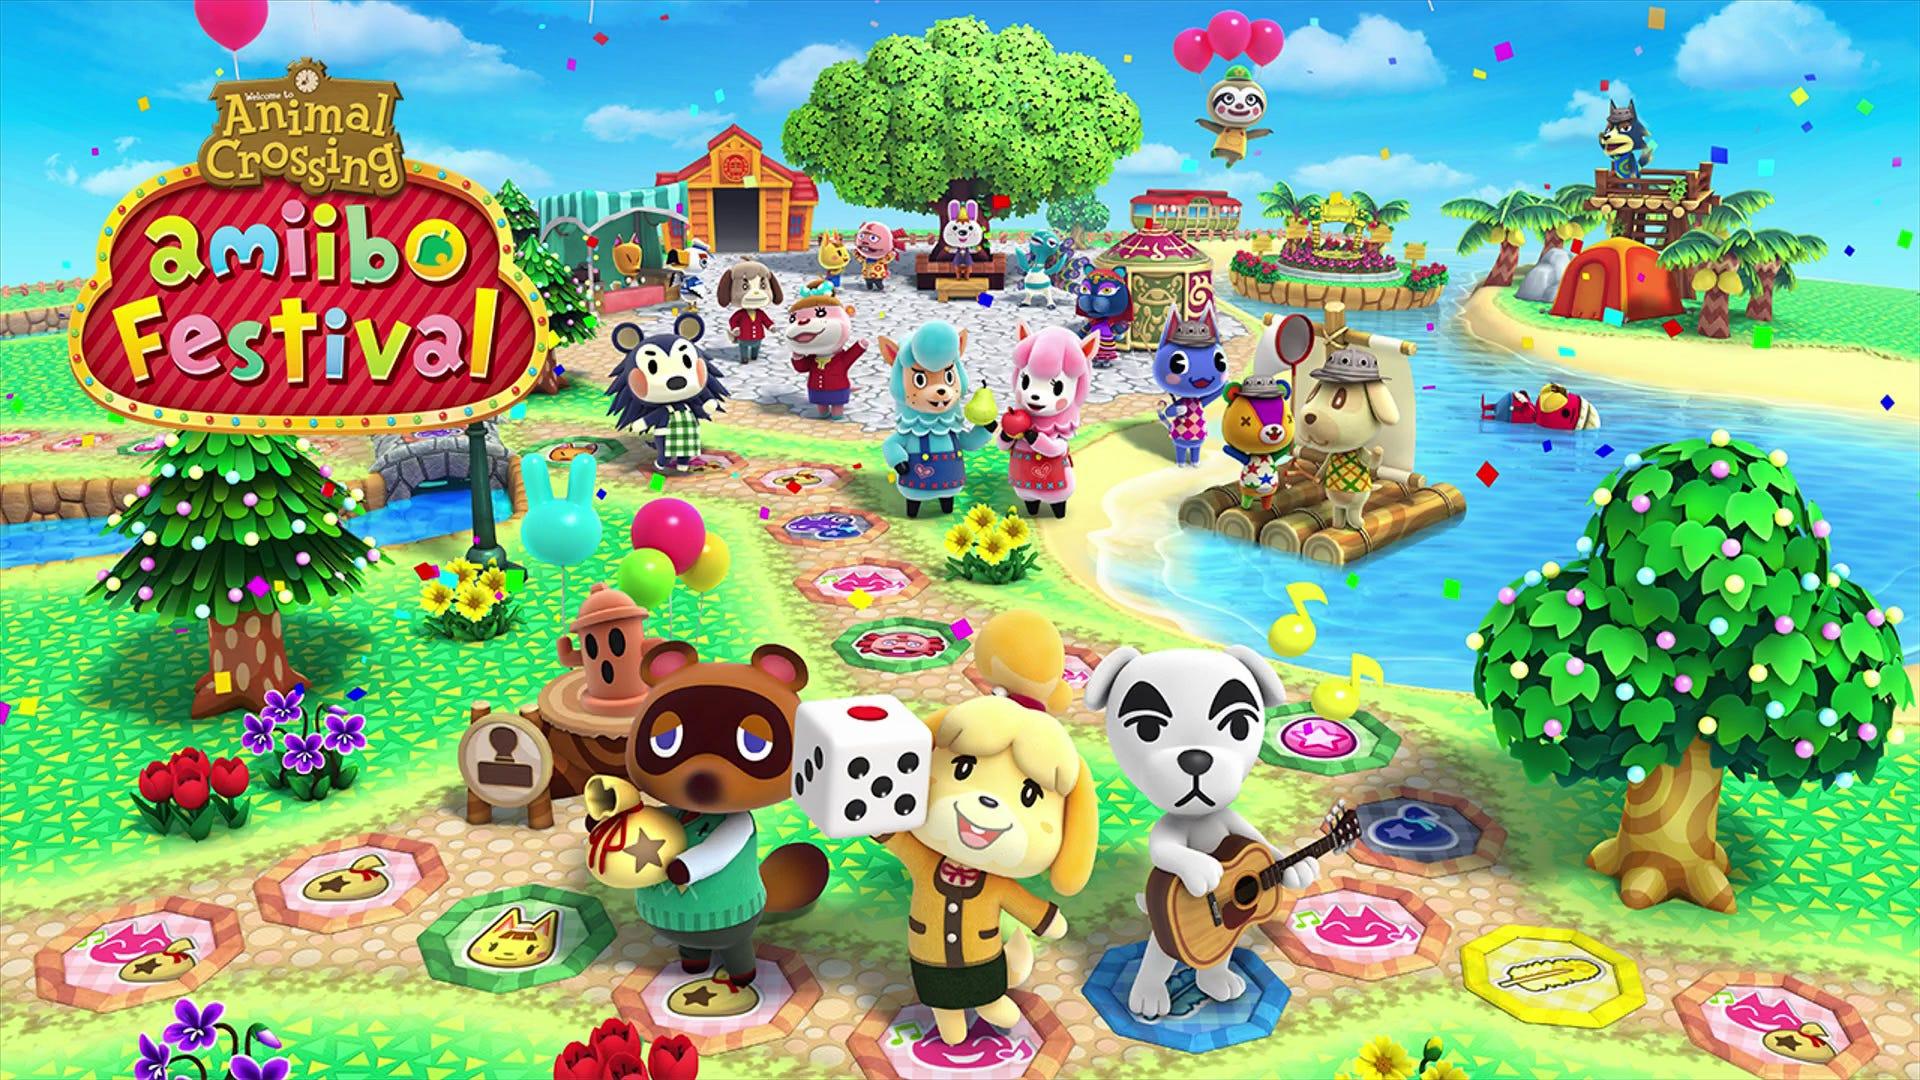 Technobubble: Animal Crossing Amiibo Festival Bundle unboxing video